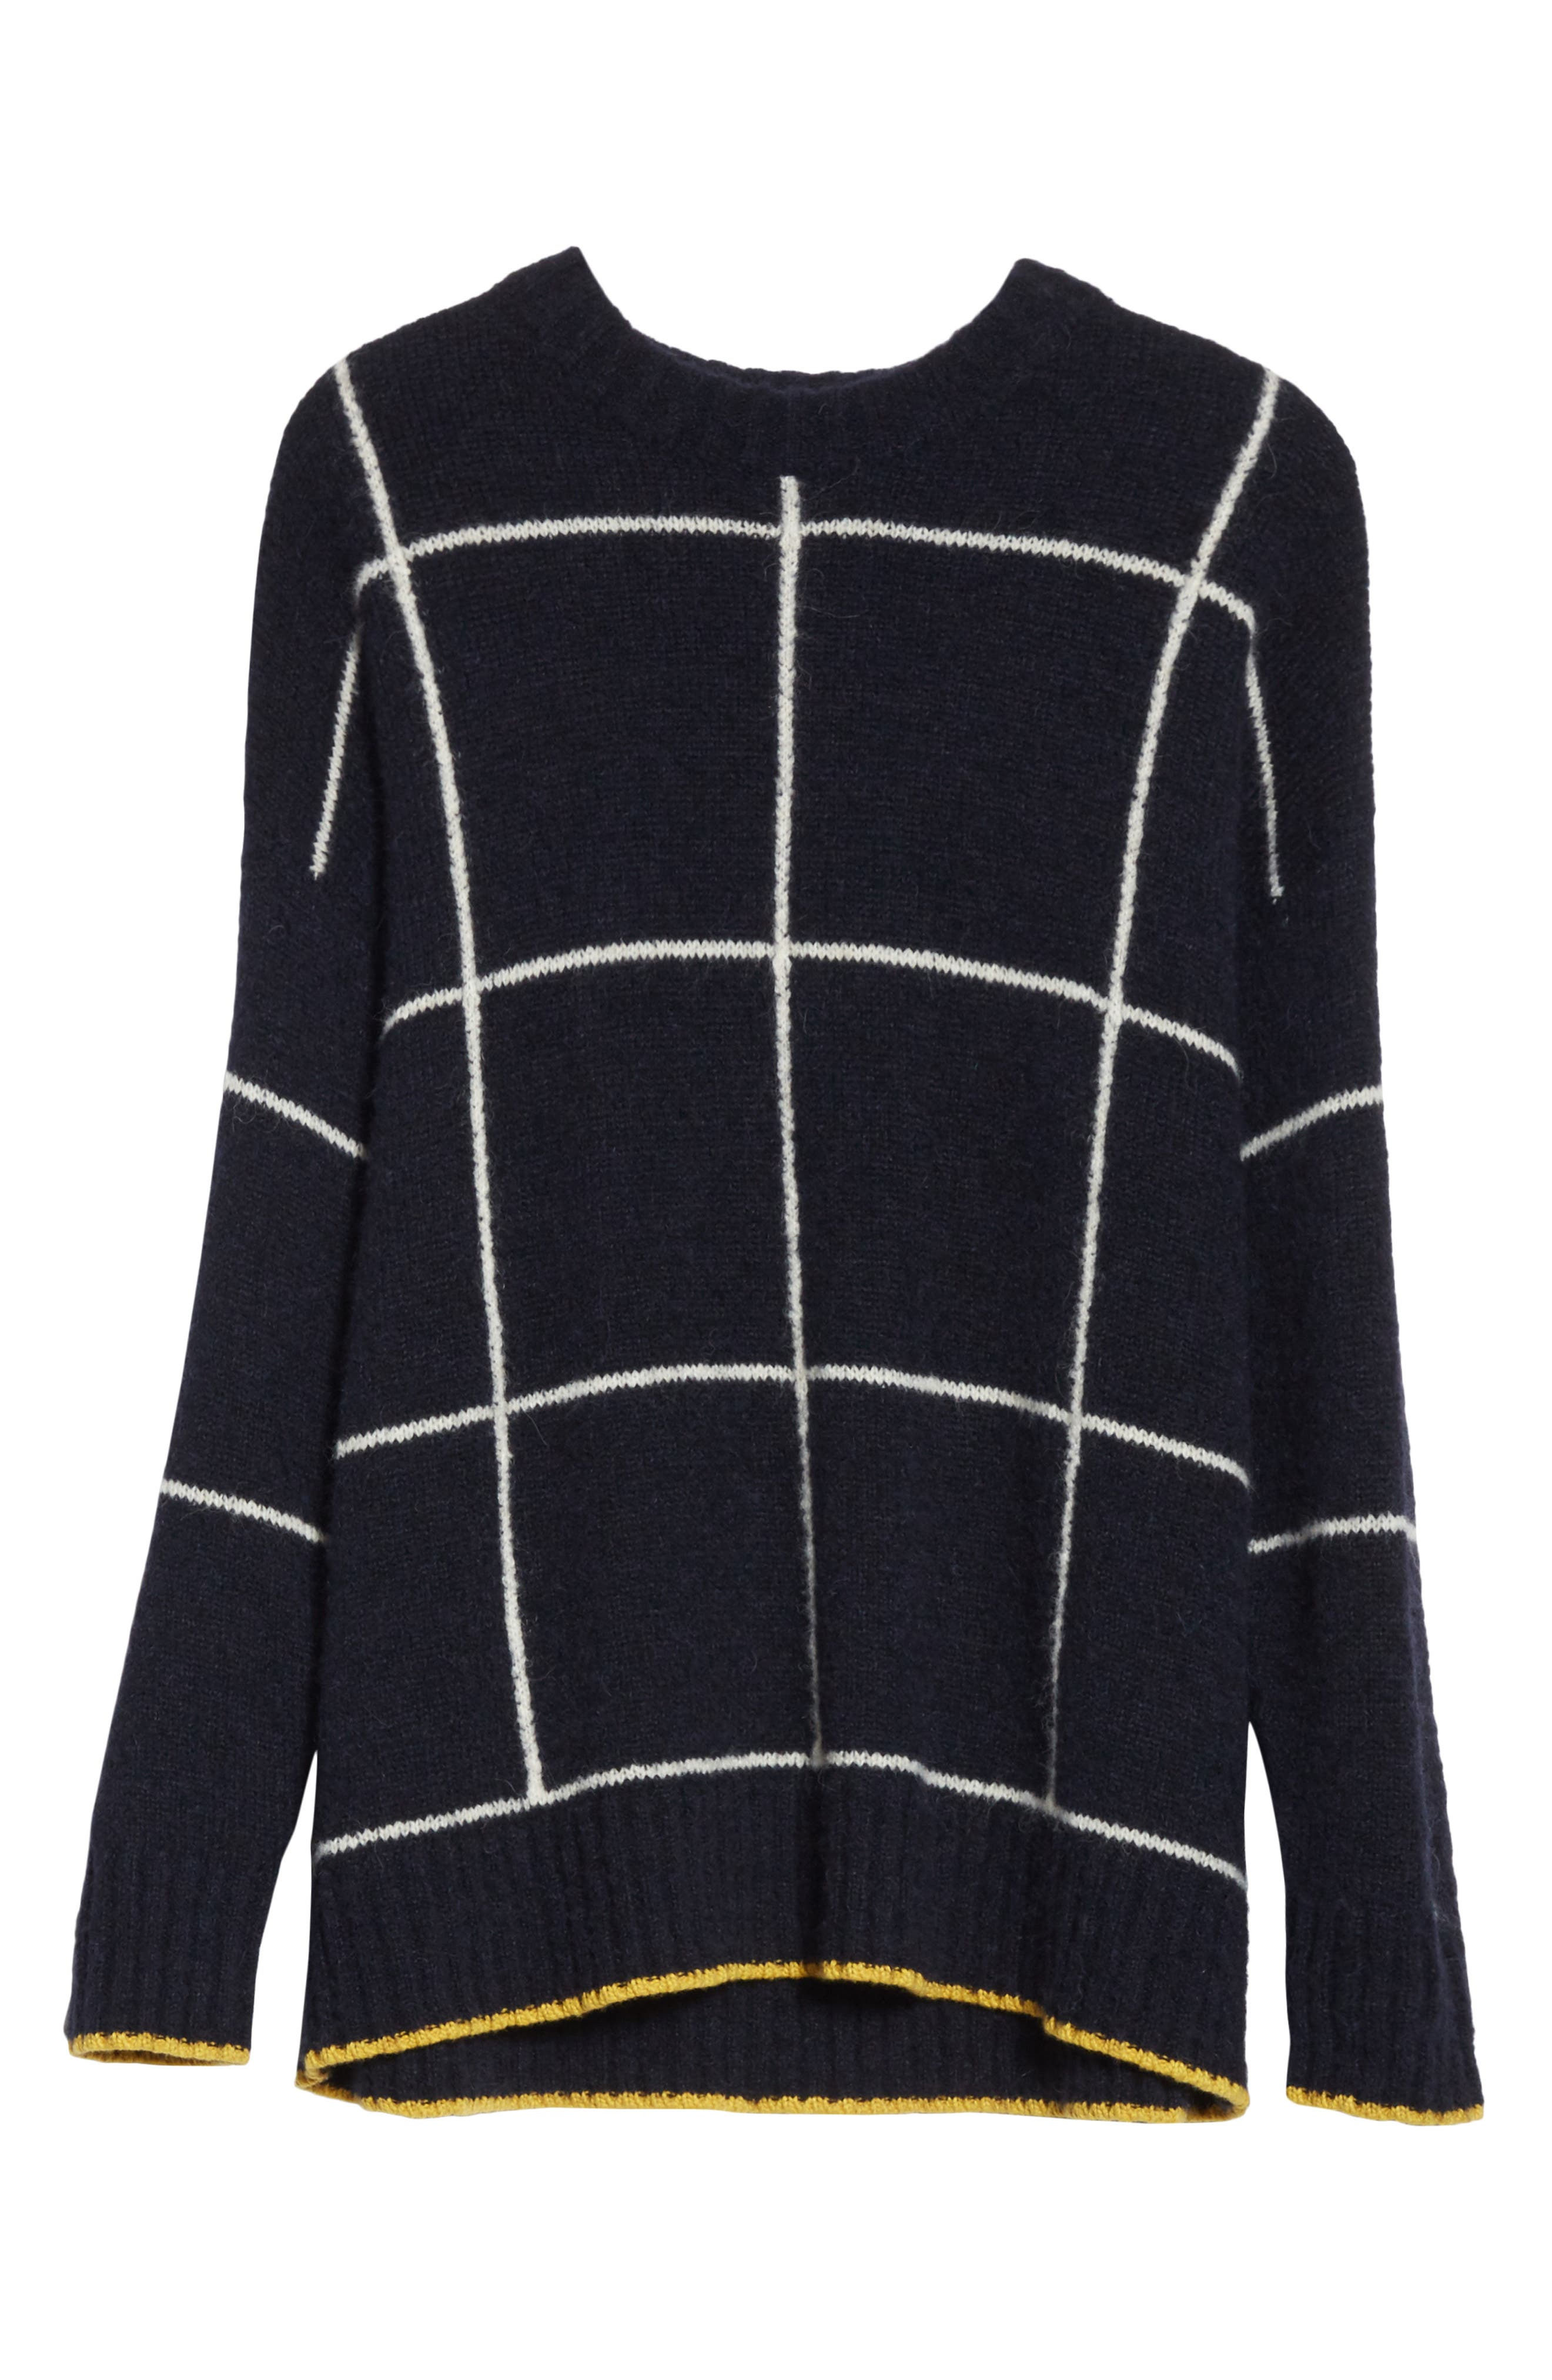 Fionn Windowpane Oversized Sweater,                             Alternate thumbnail 6, color,                             Navy/ Alabaster/ Pollen